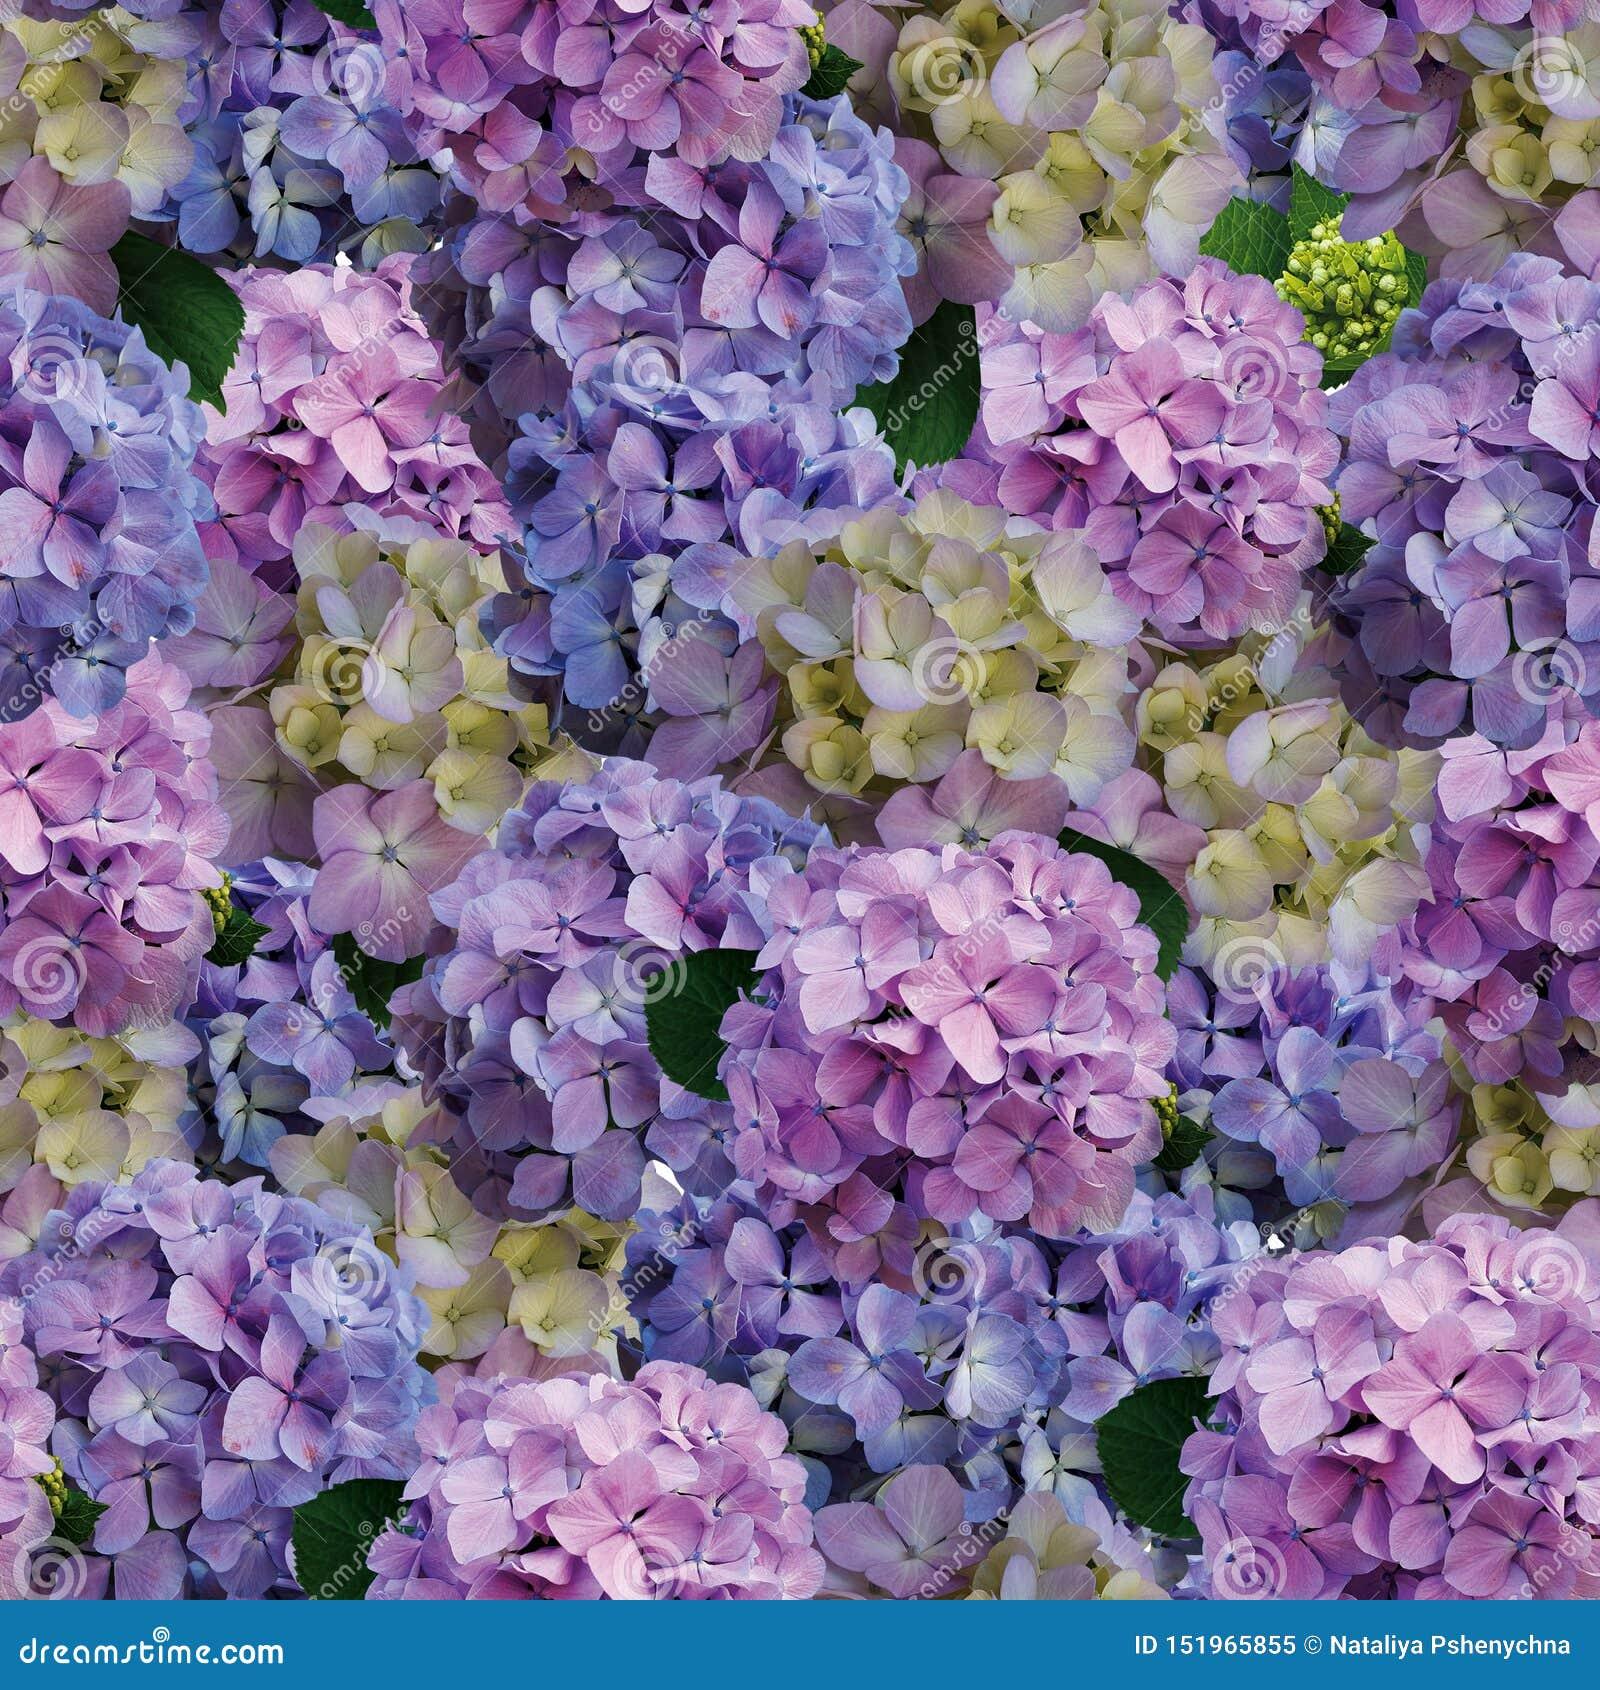 Beautiful hydrangea flowers background